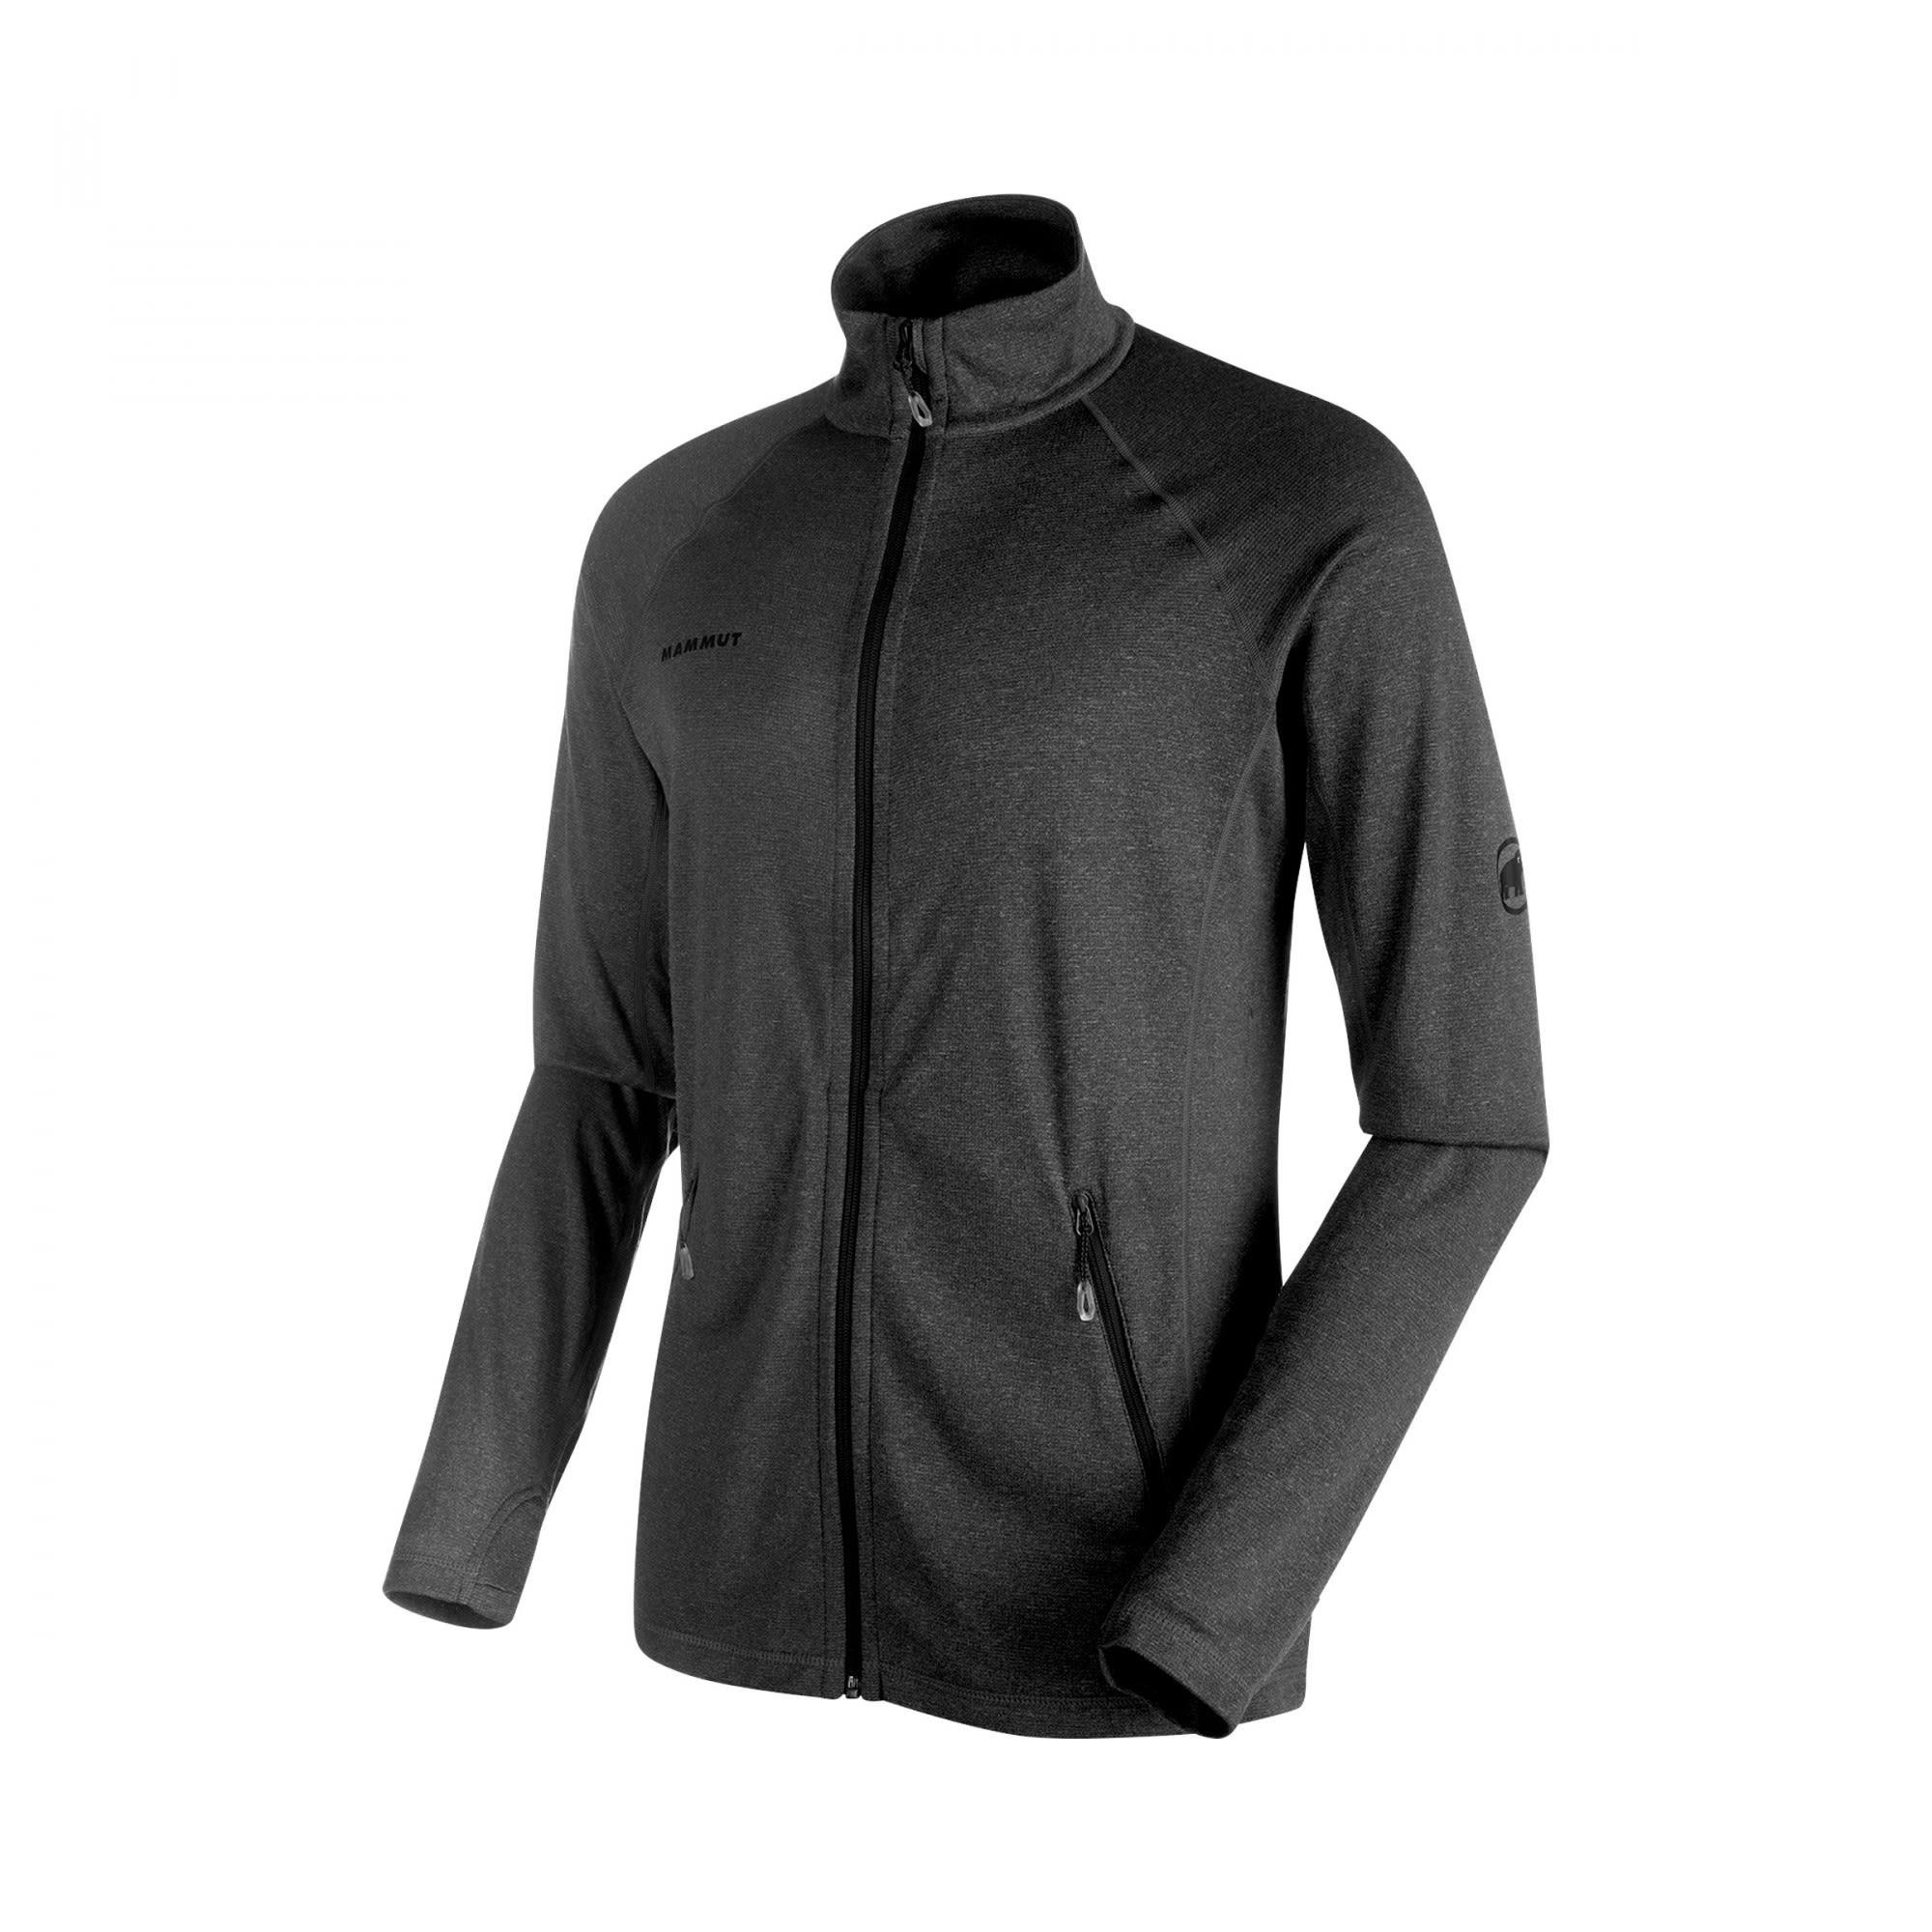 Mammut Runbold Light ML Jacket Grau, Male Polartec® Freizeitjacke, L